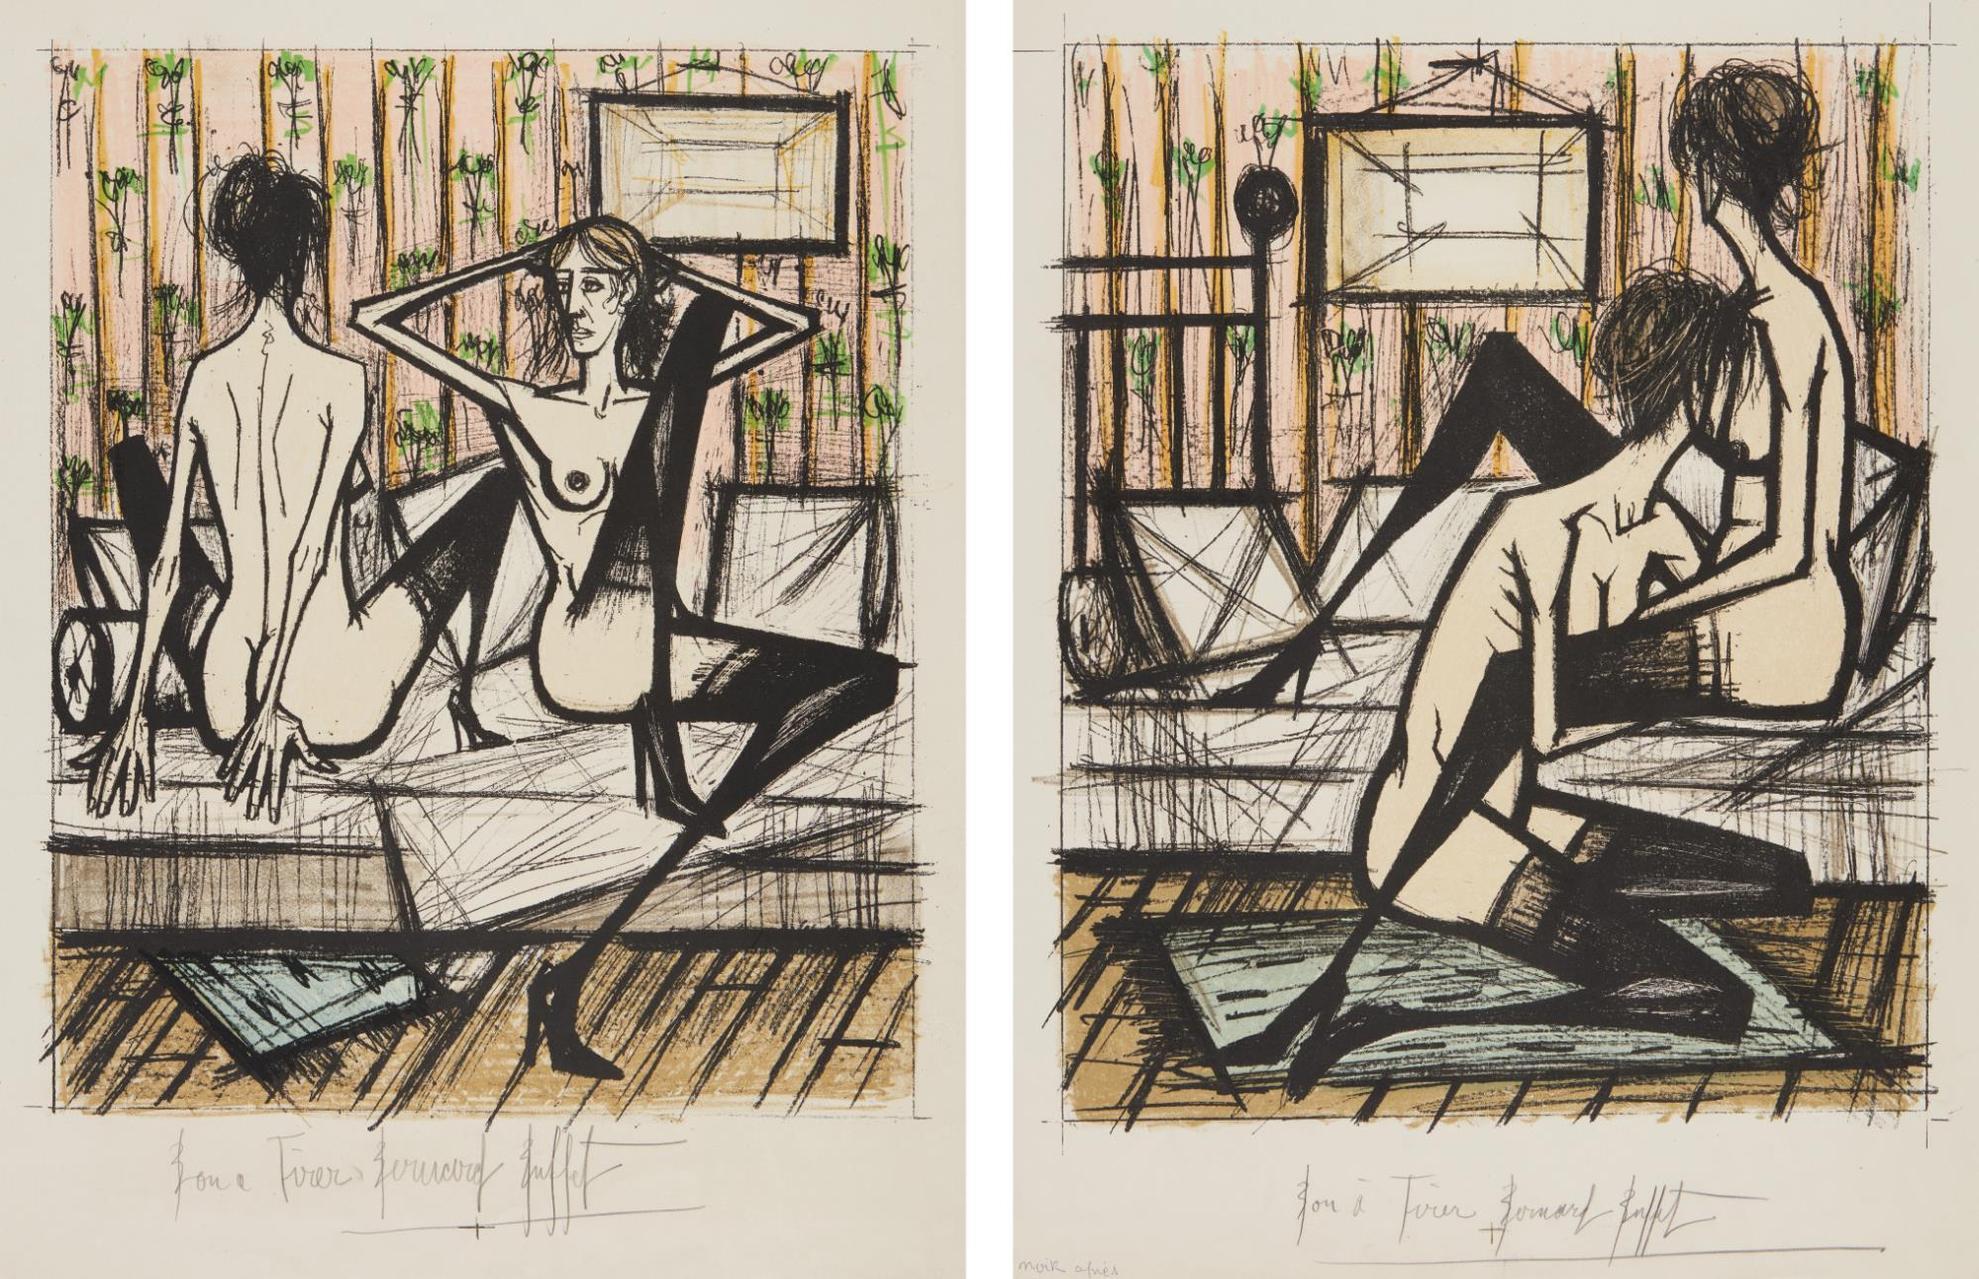 Bernard Buffet-Printemps (Springtime); And Ete (Summer), From Jeux De Dames (Checkers Game)-1970